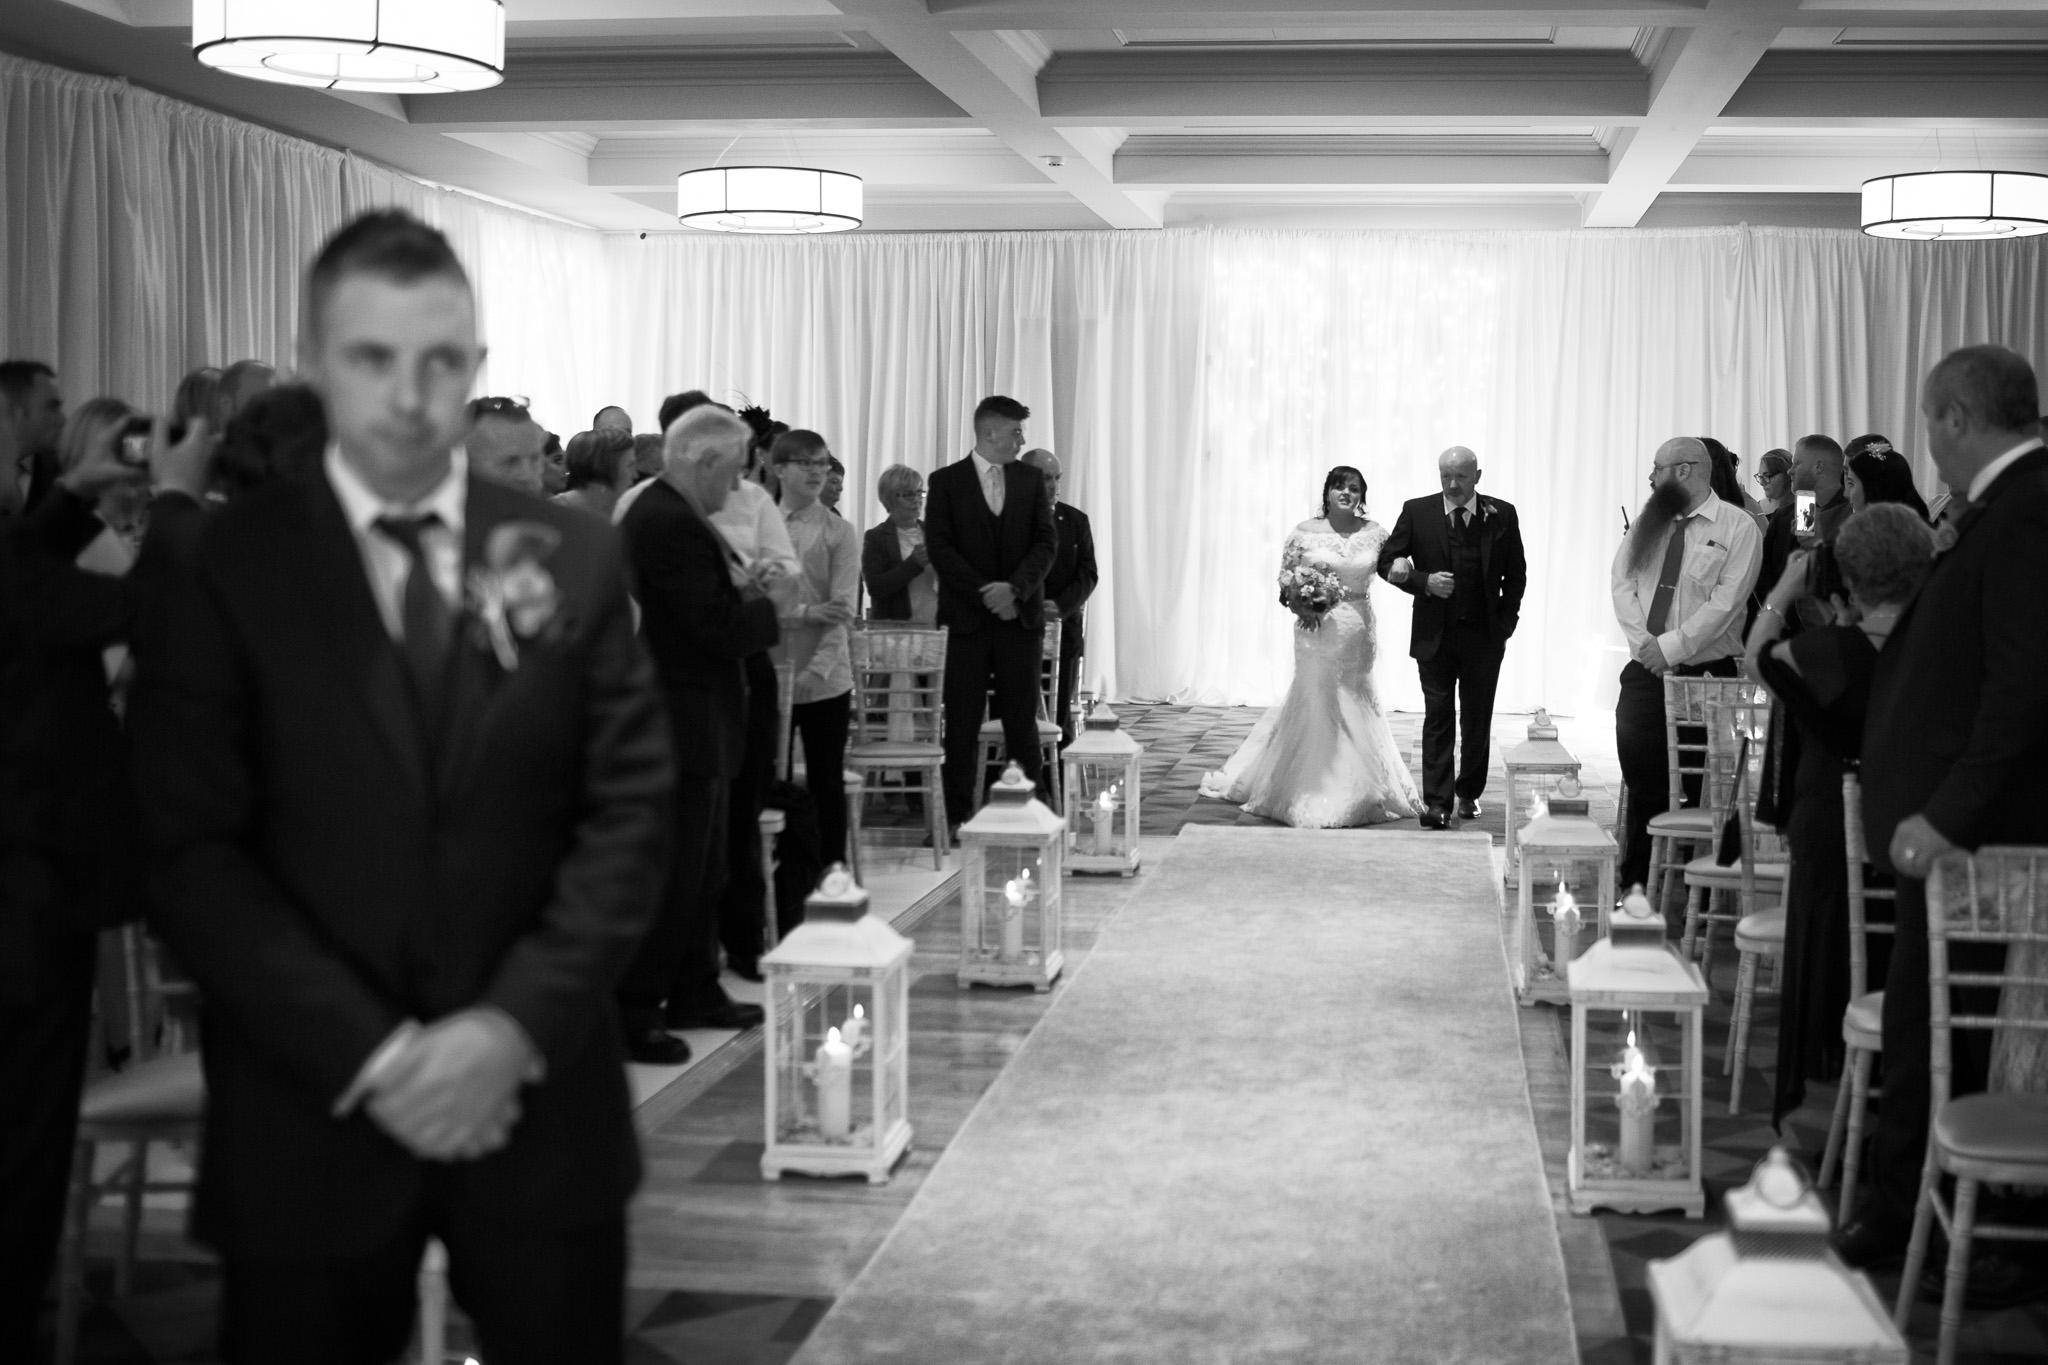 Mark_Barnes_Northern_Ireland_Wedding_Photography_Marine_hotel_ballycastle_Wedding_Photography_Janet&Darren-12.jpg